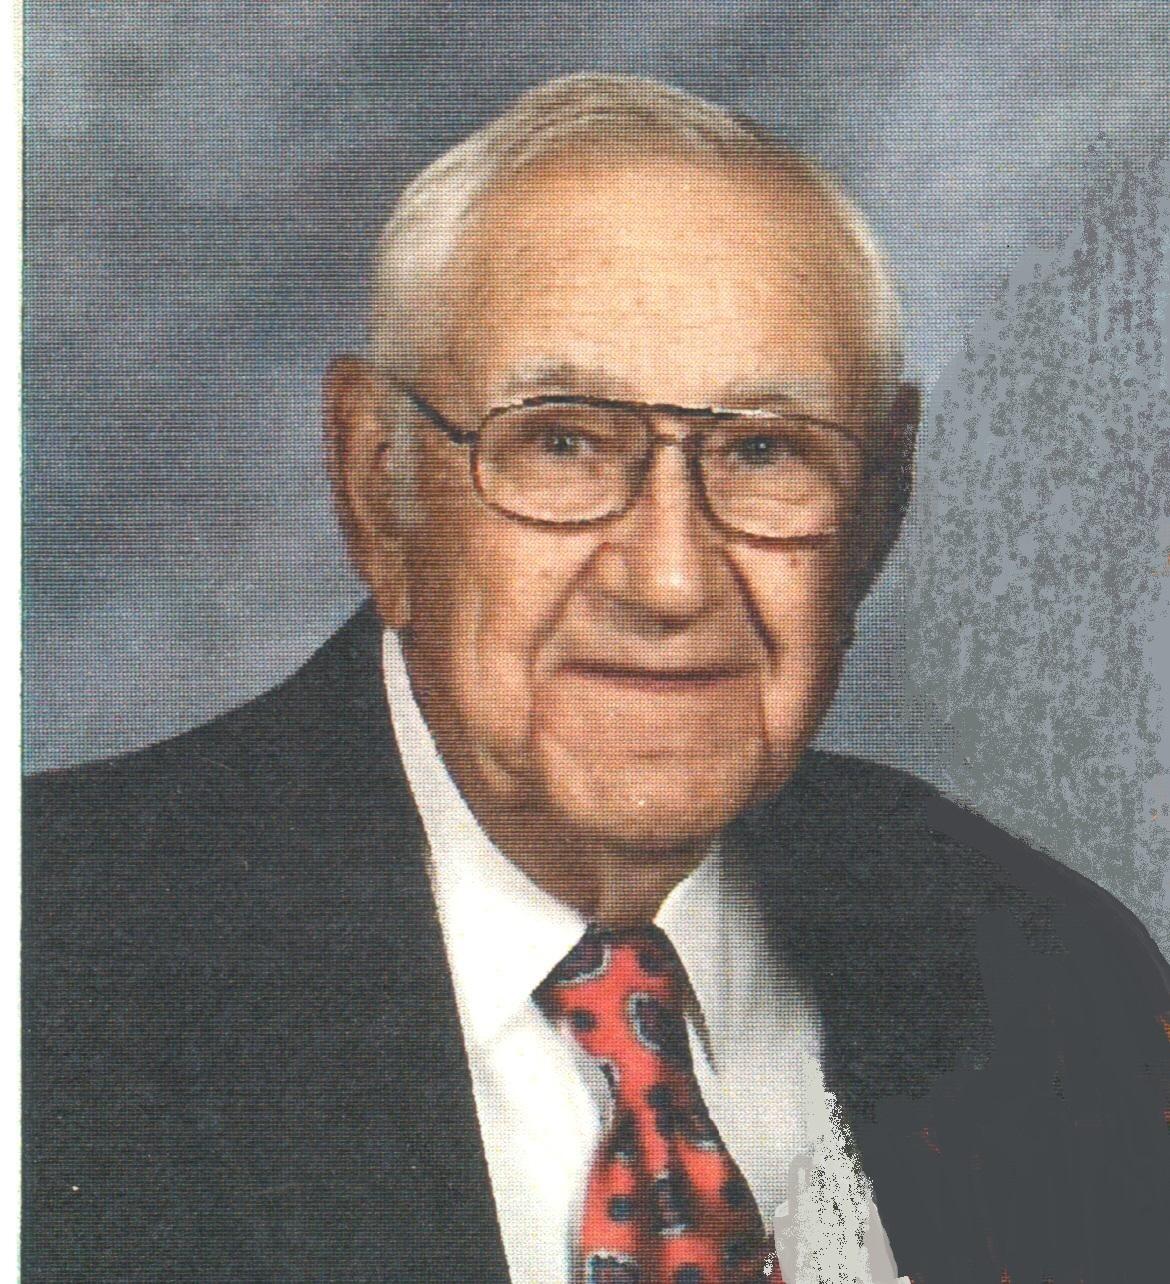 Sylvester M. Giesler, age 95 of Jasper